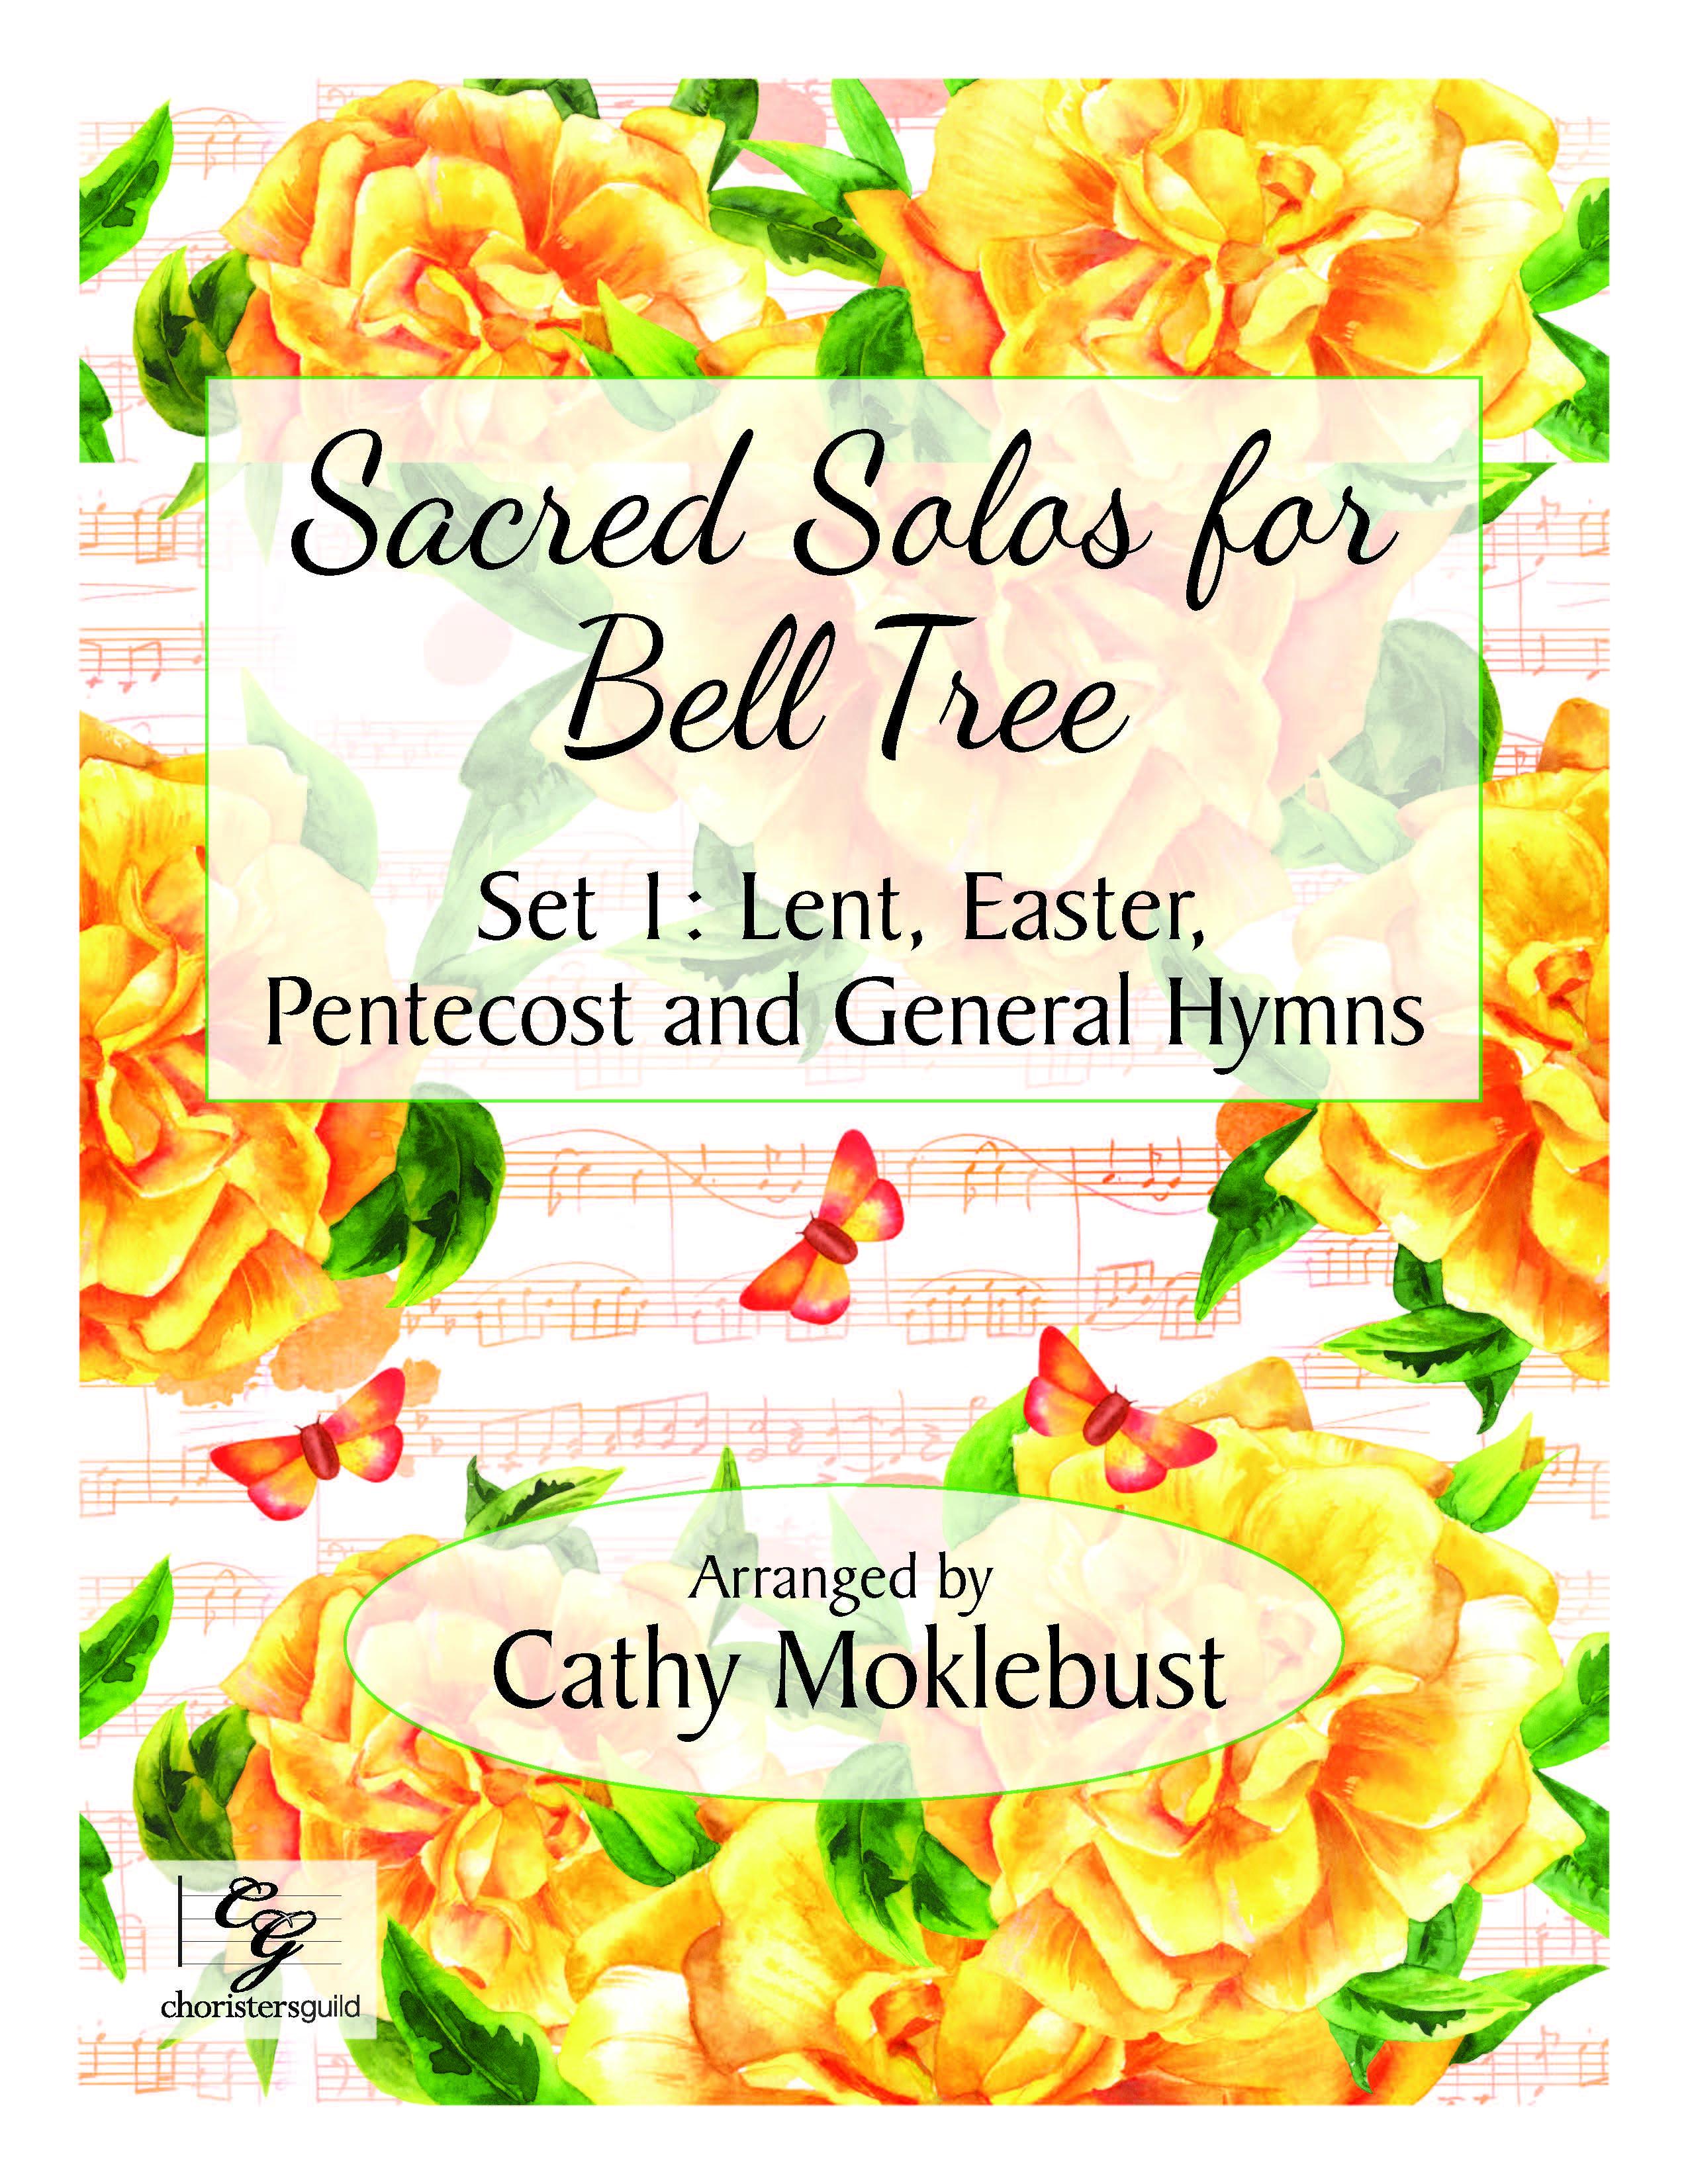 Sacred Solos for Bell Tree, Set 1 (Digital Score) - Solo Handbells